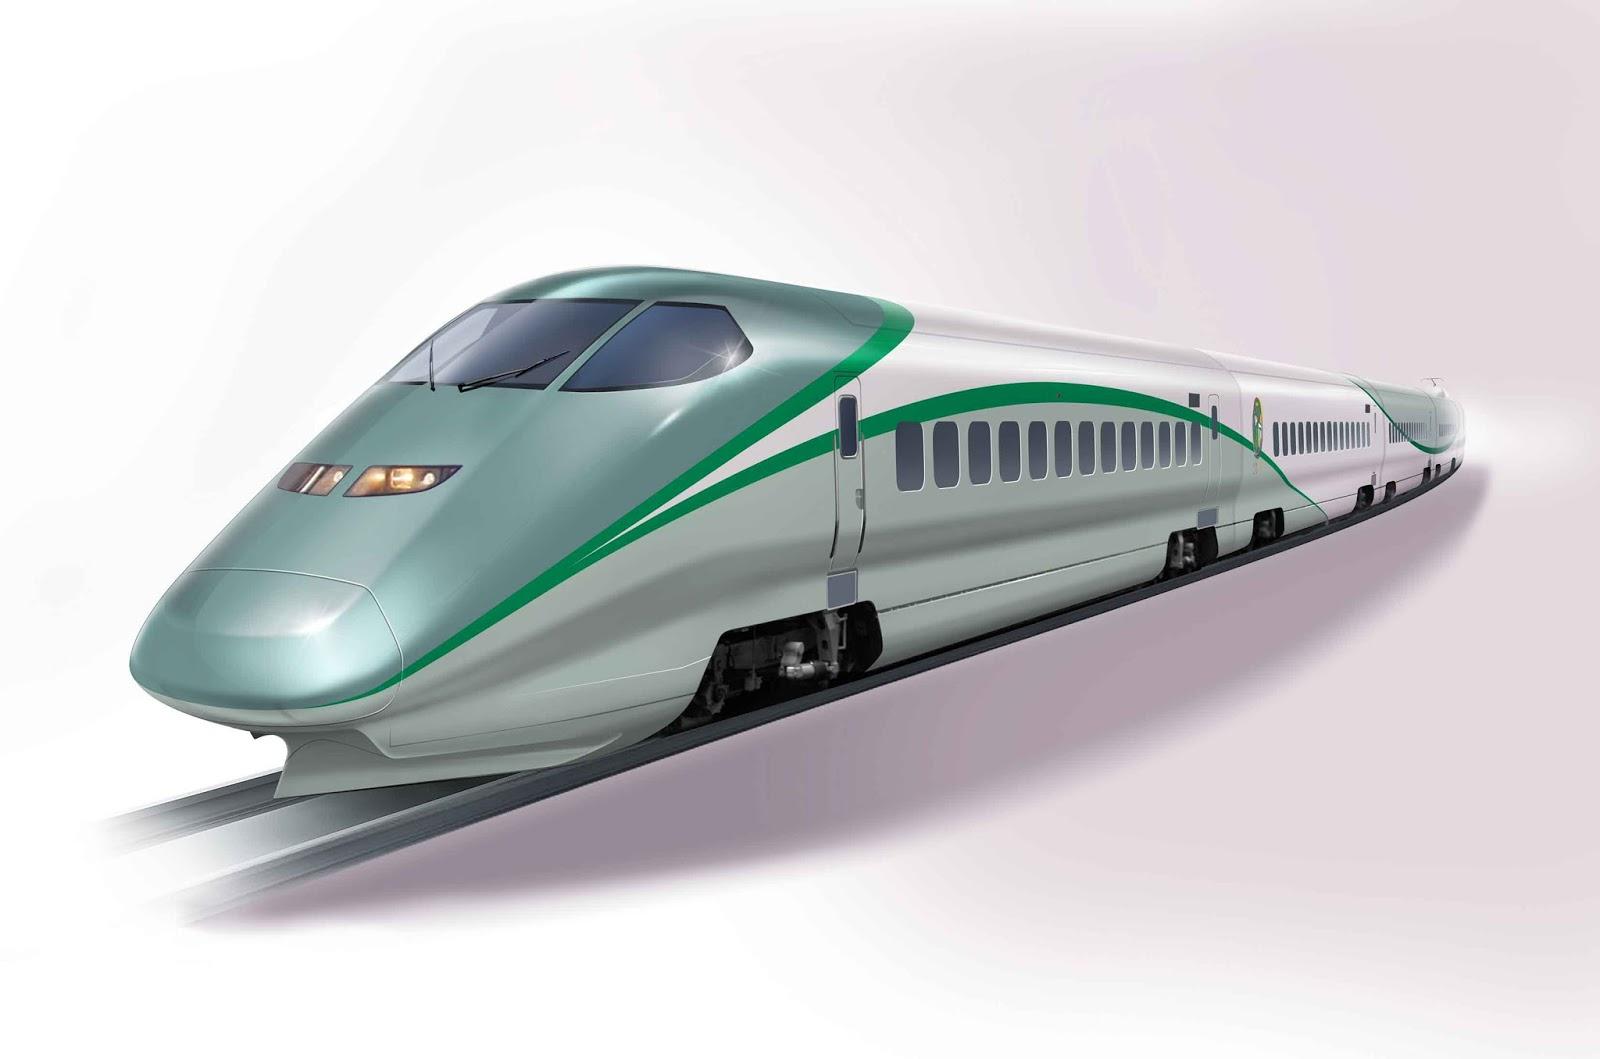 7maglev train image7